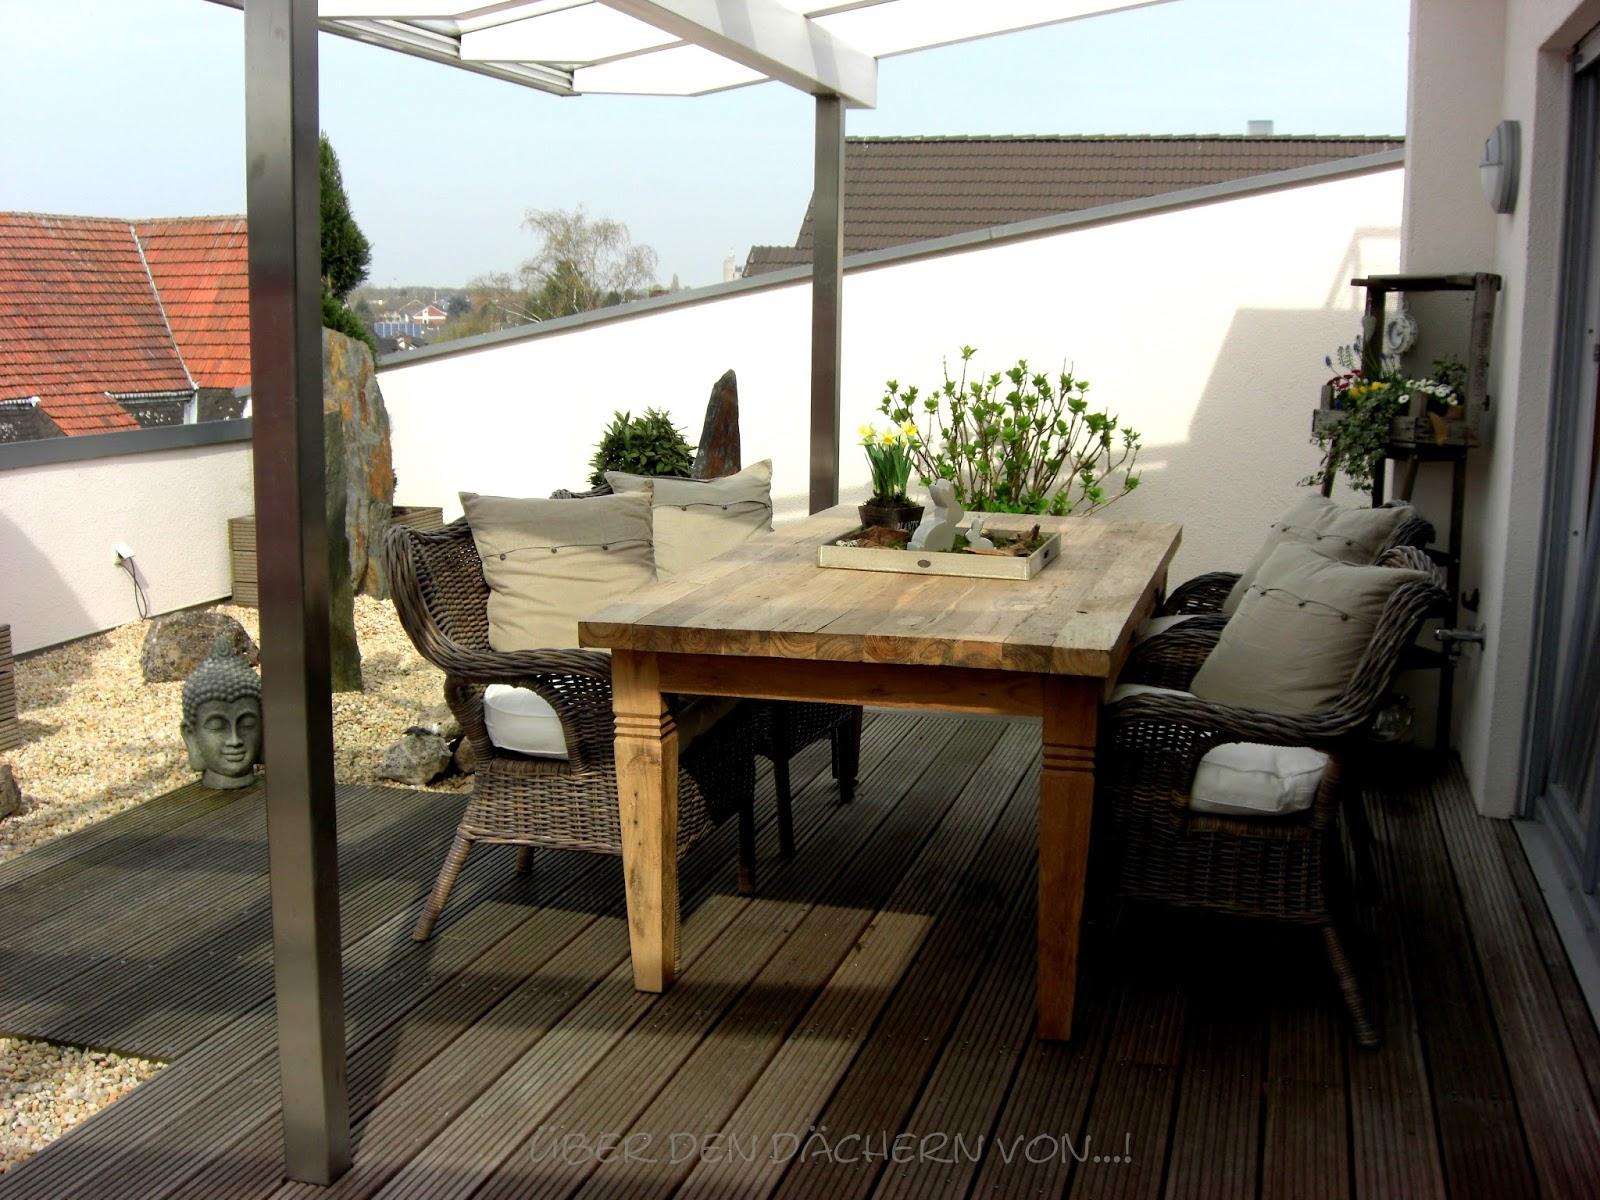 osterdeko drau en ber den d chern osterdeko. Black Bedroom Furniture Sets. Home Design Ideas